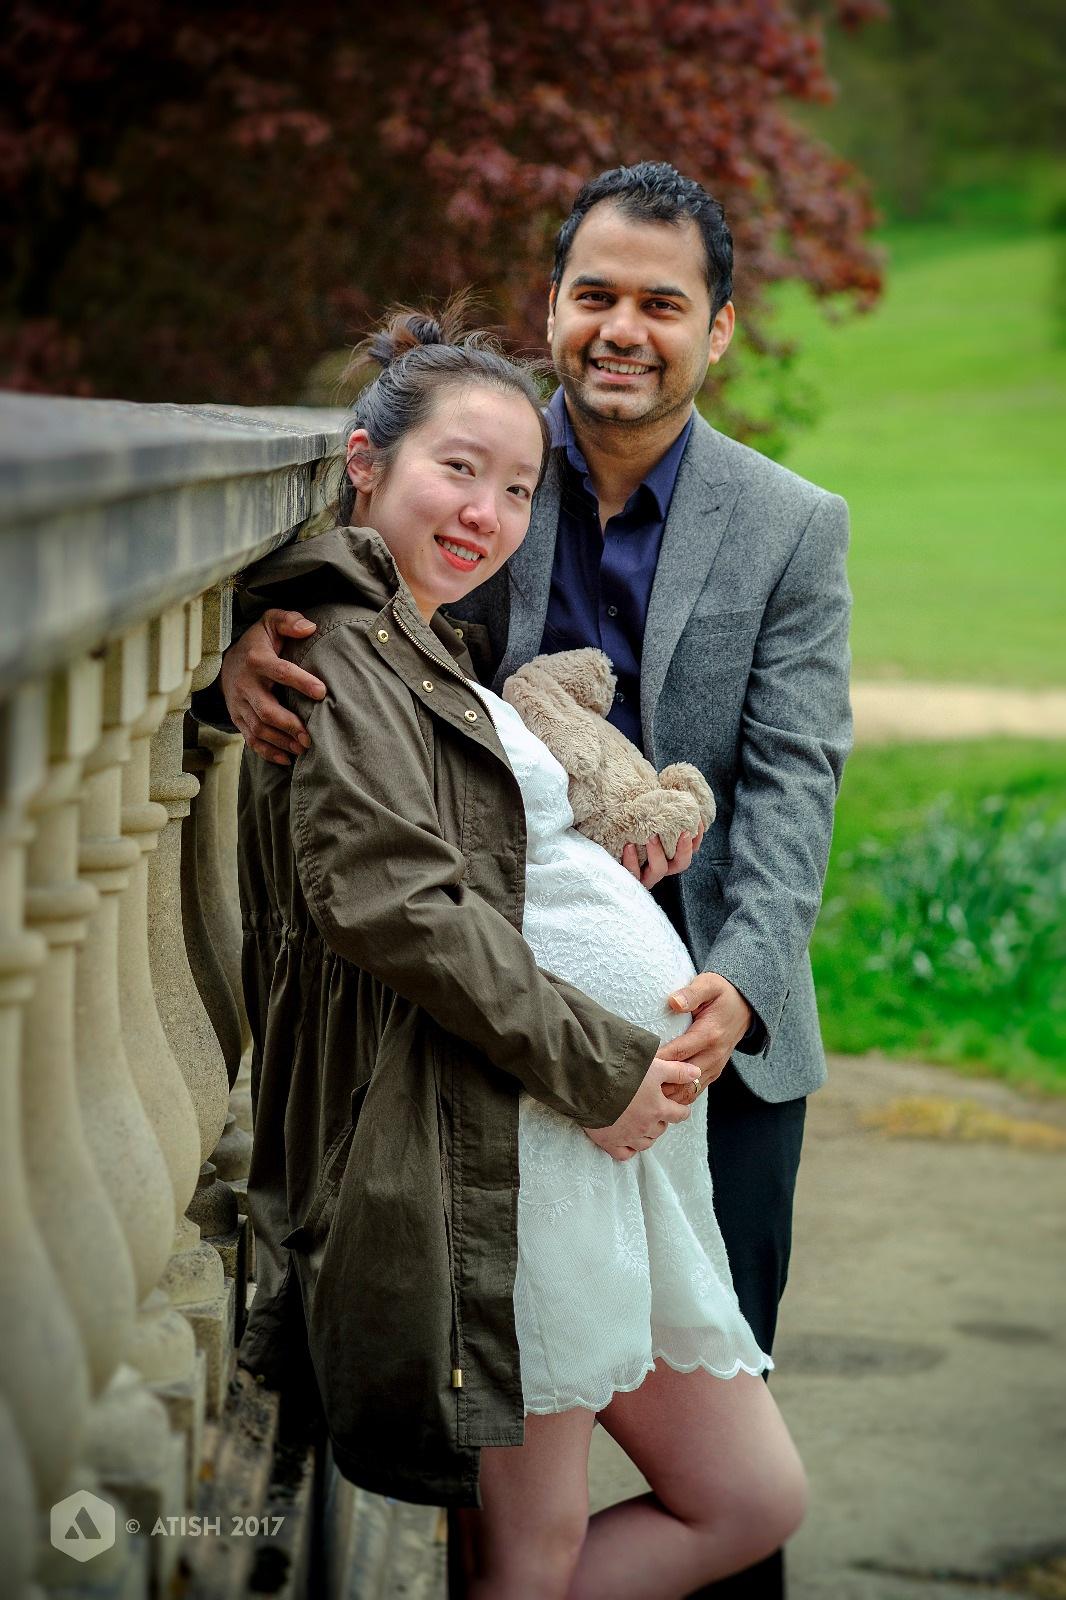 New parents by Atish Chitrakar